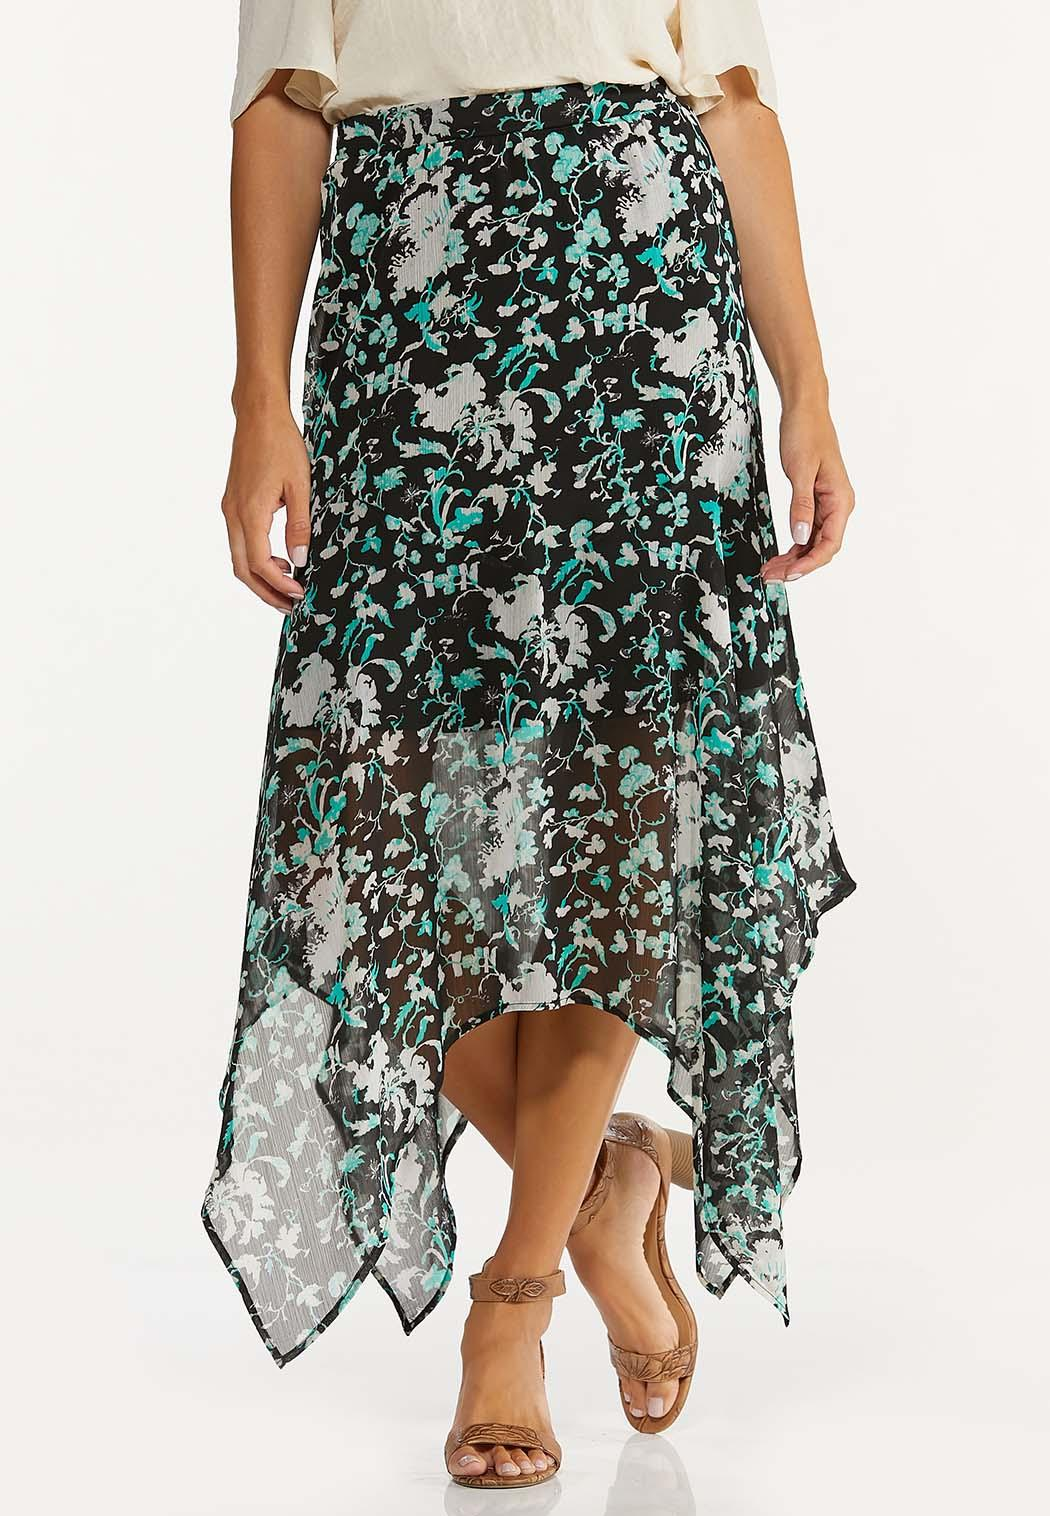 Textured Floral Hanky Hem Skirt